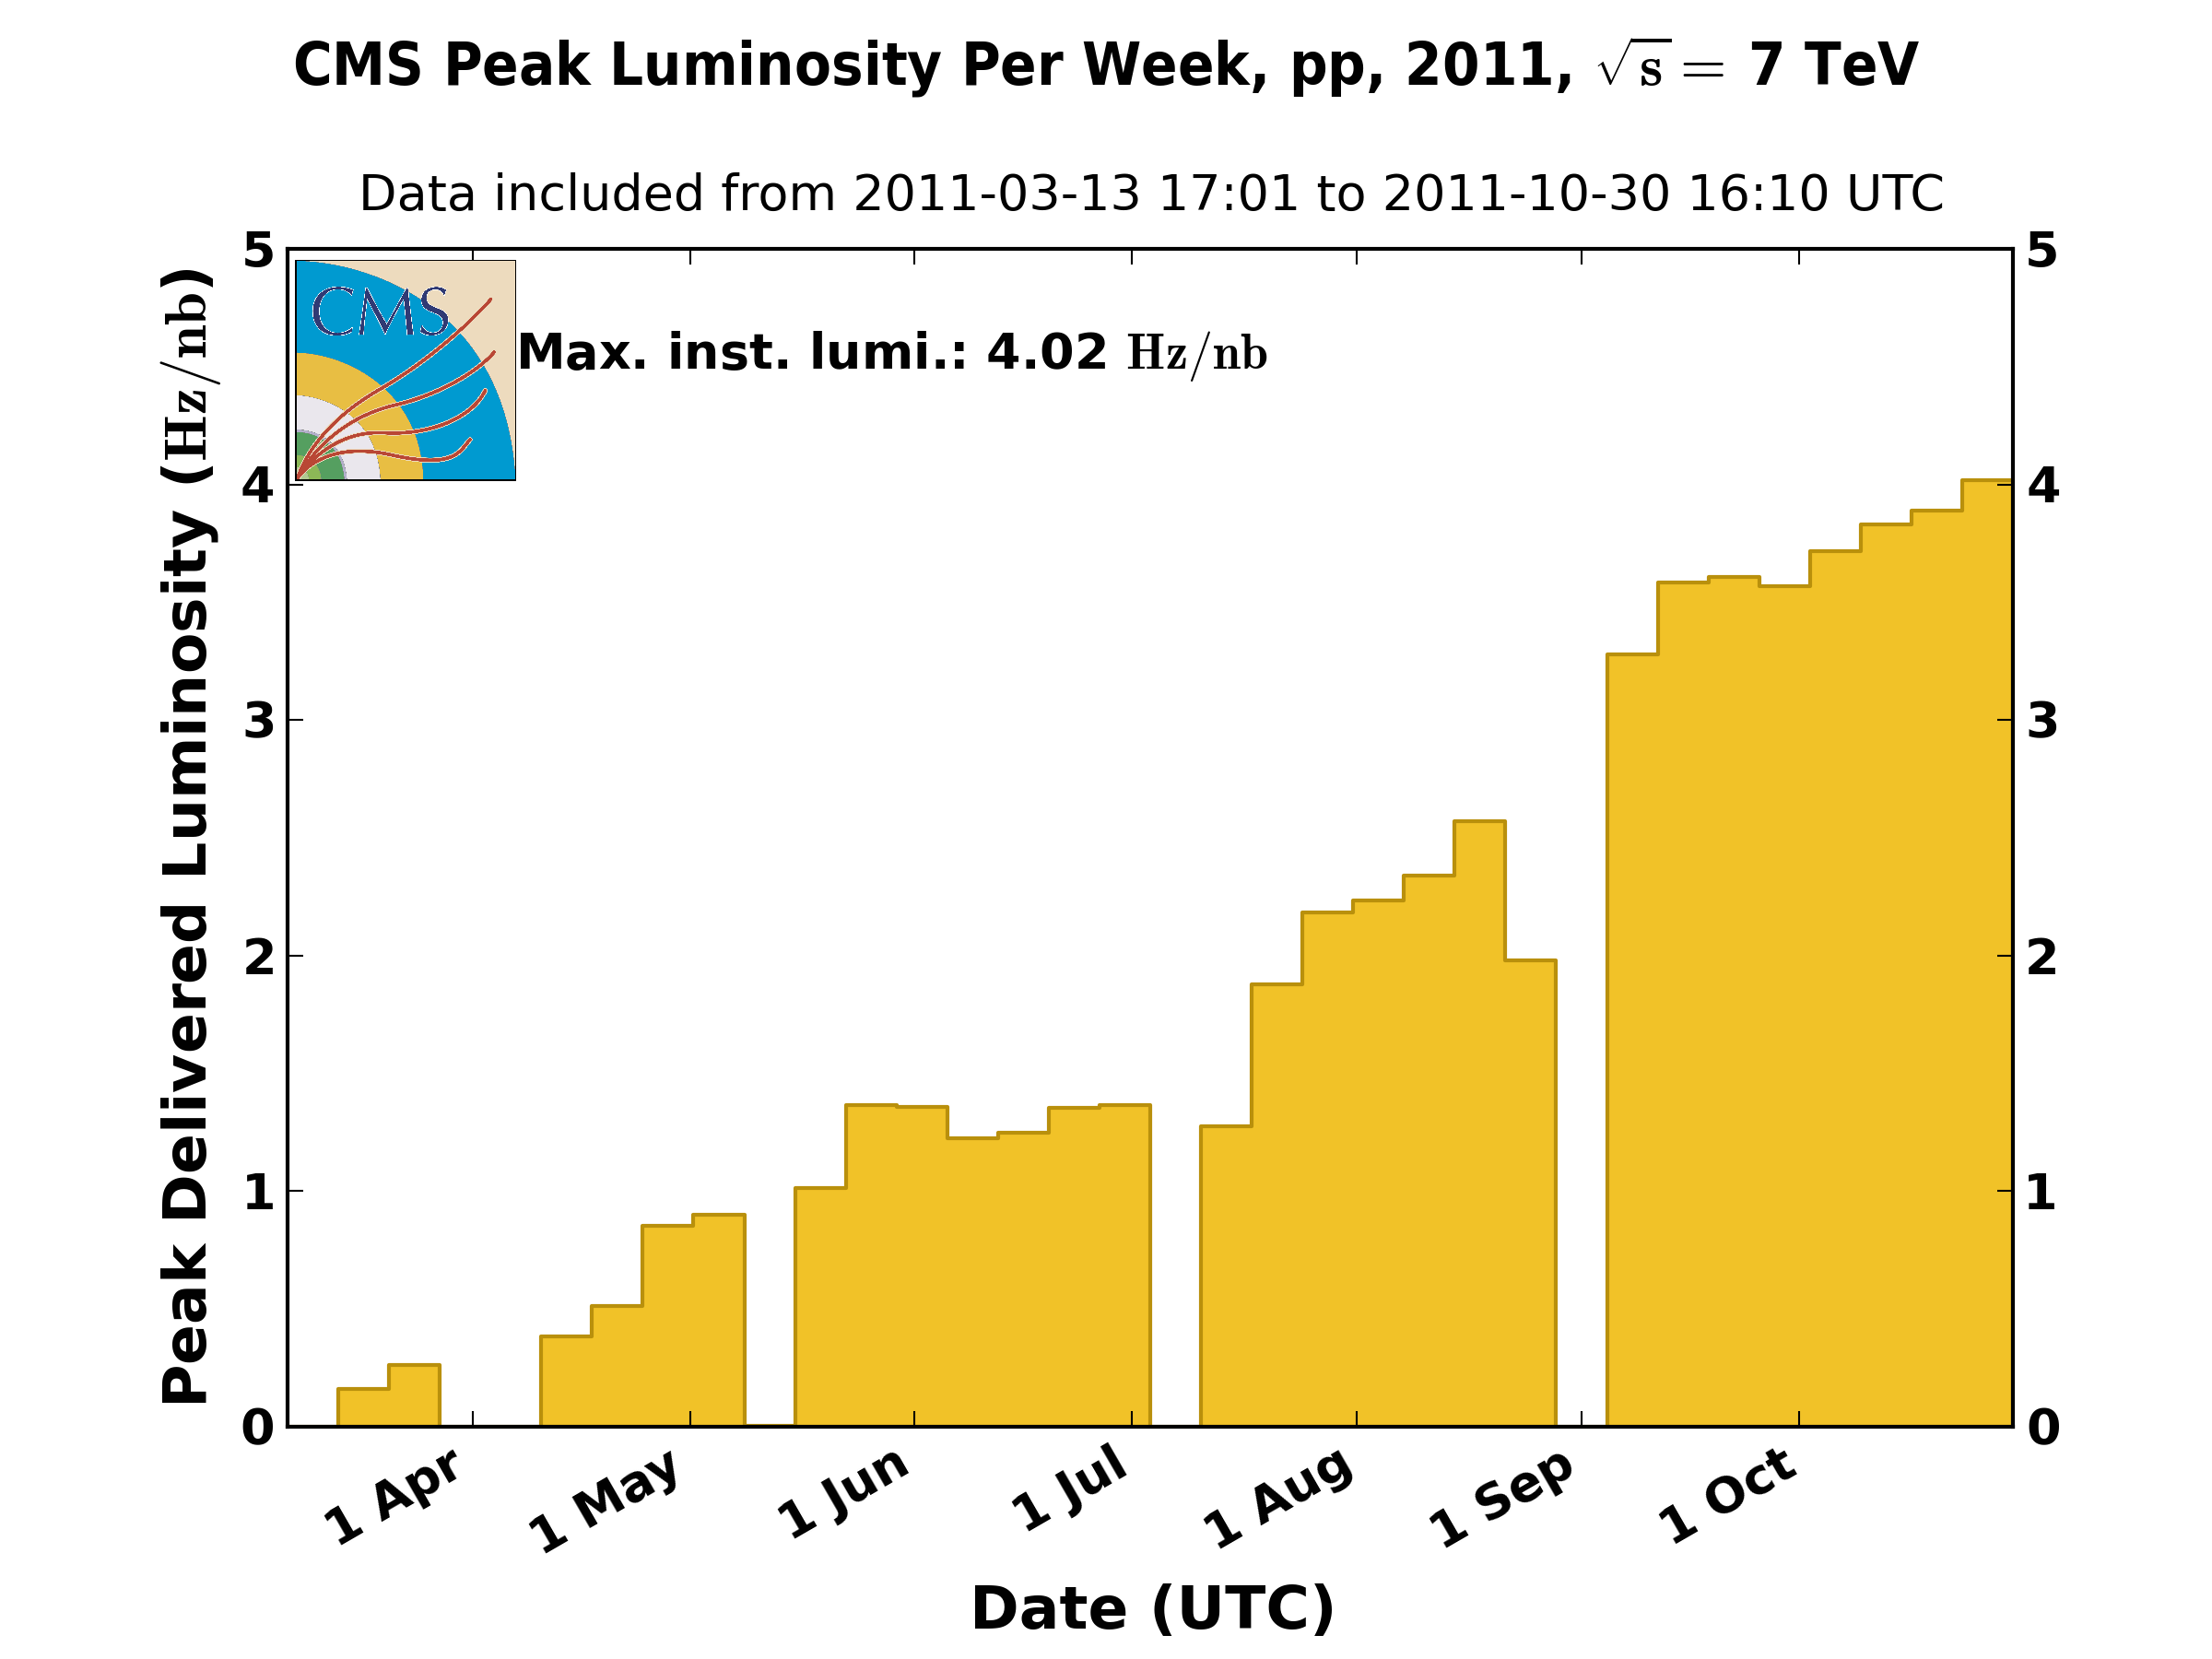 https://cern.ch/cmslumi/publicplots/peak_lumi_per_week_pp_2011.png